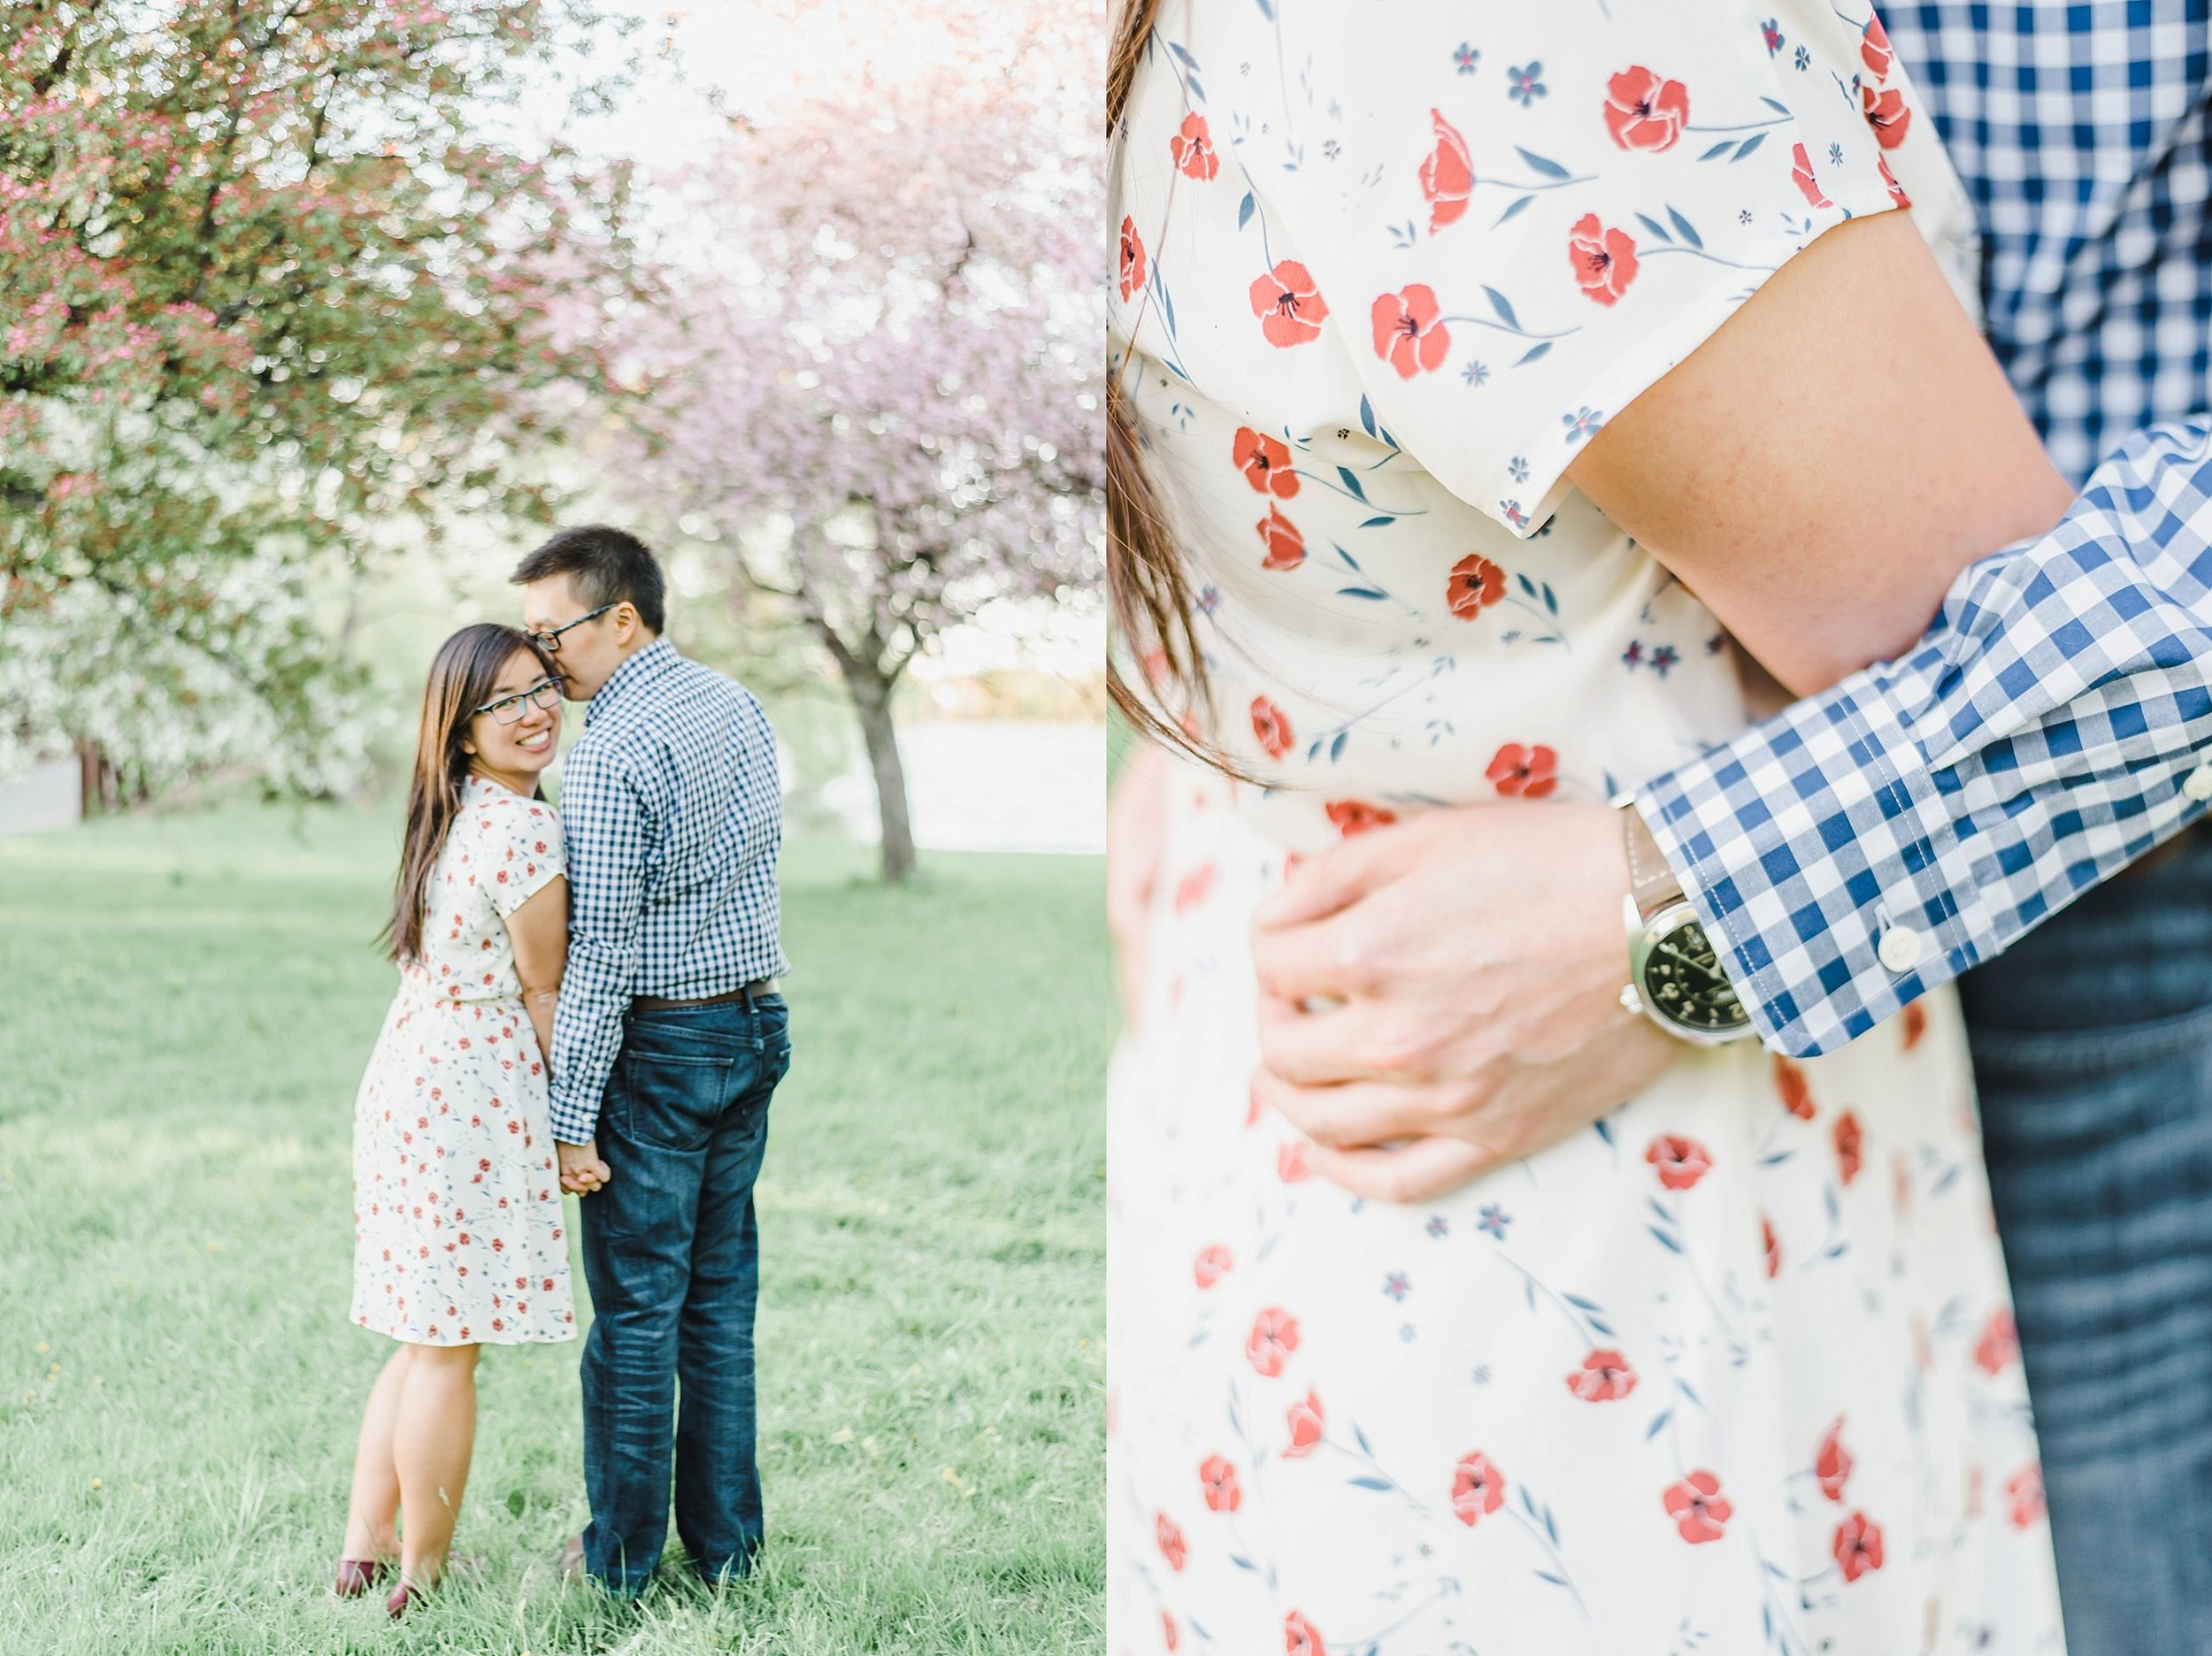 light airy indie fine art ottawa wedding photographer | Ali and Batoul Photography_0019.jpg